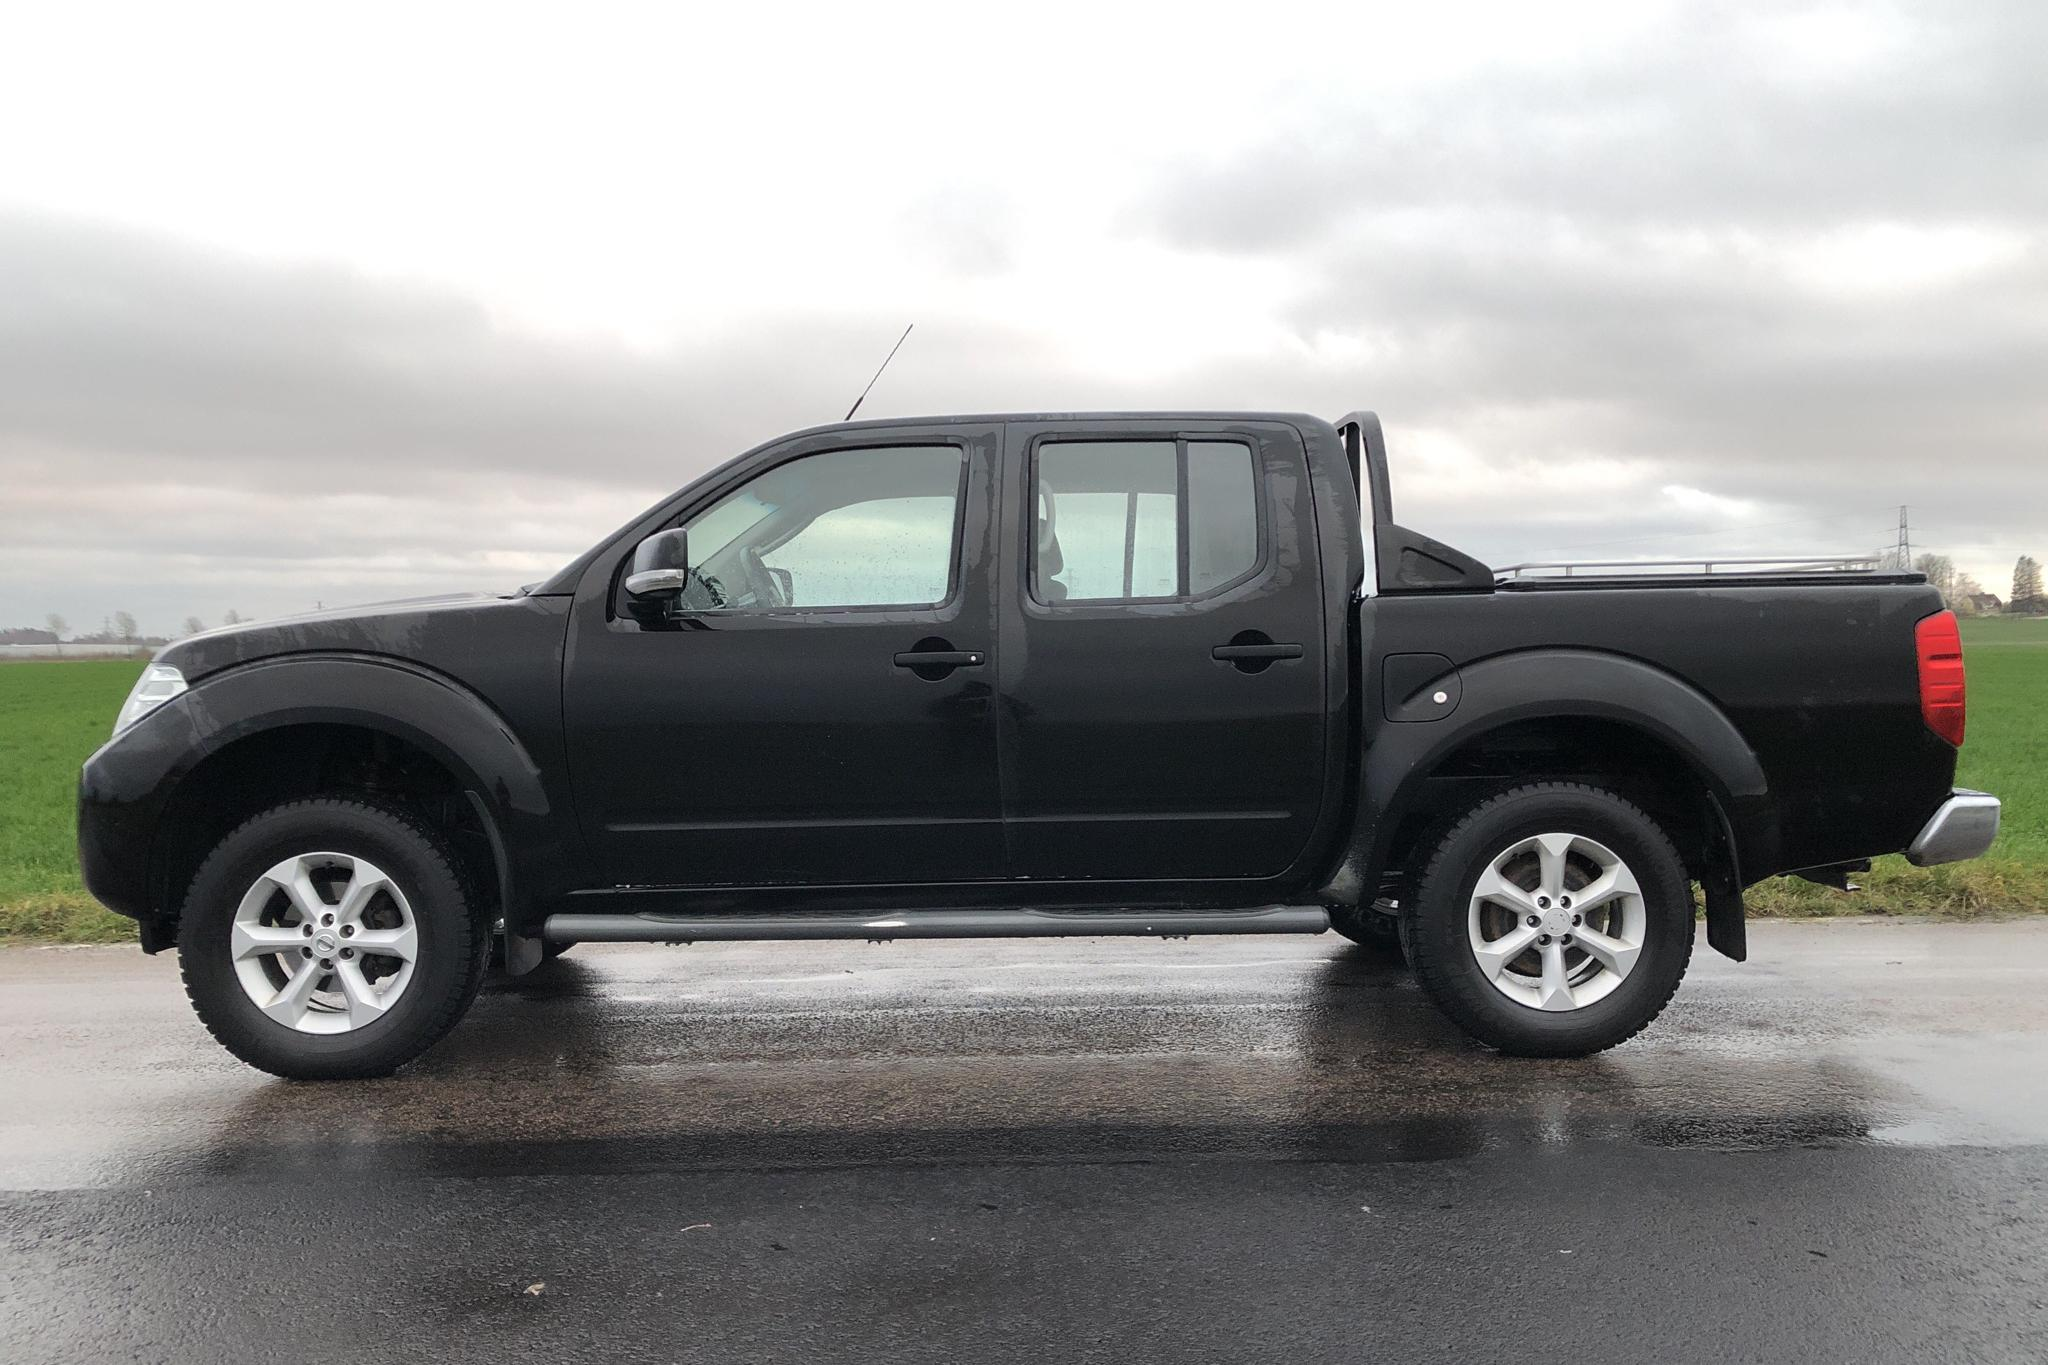 Nissan Navara 2.5 dCi (190hk) - 18 760 mil - Manuell - svart - 2011